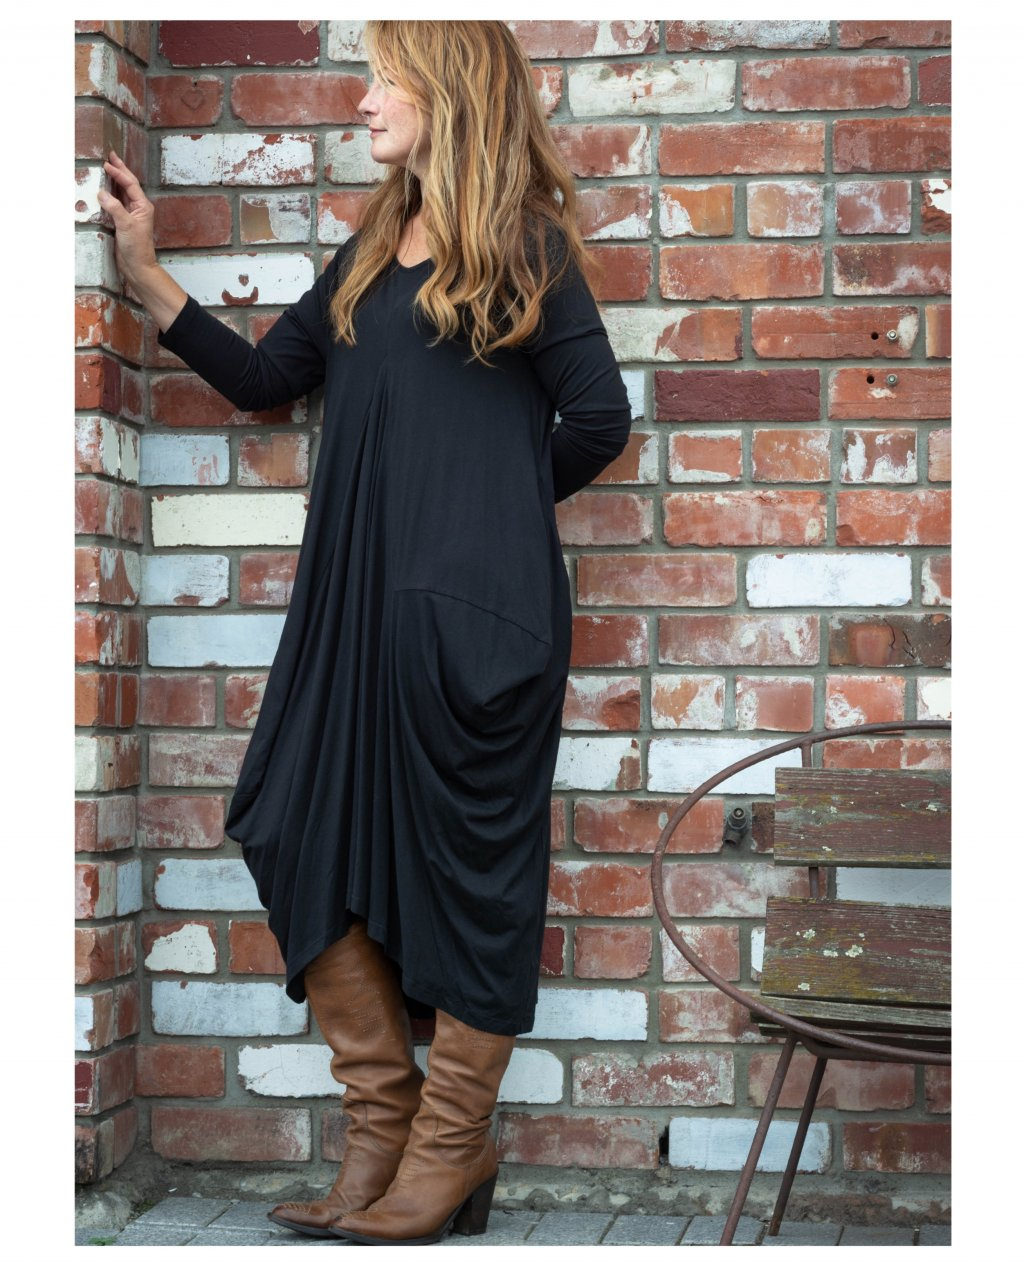 Jason Lingard   Helios Dress   Black